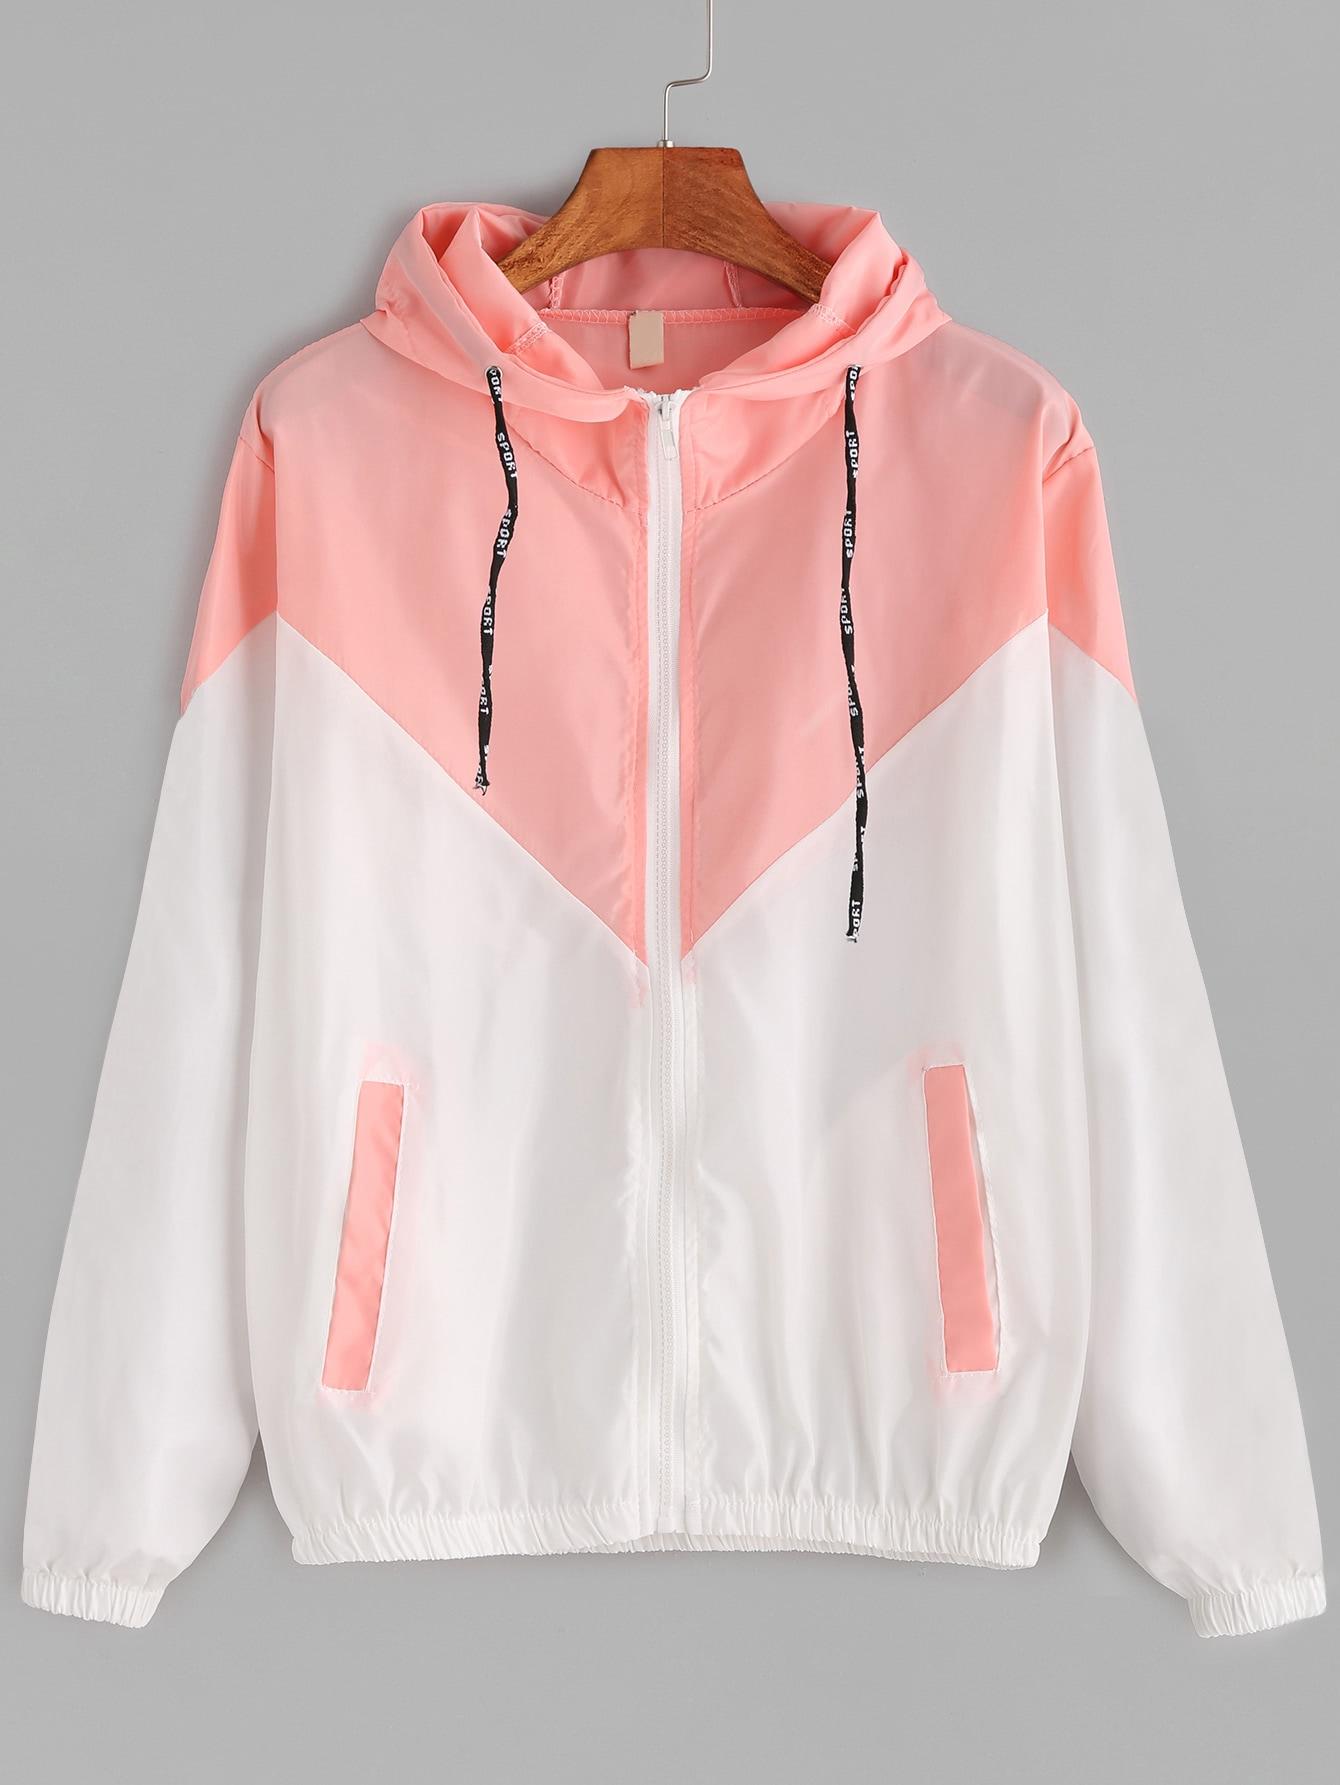 Contrast Drawstring Hooded Zip Up JacketFor Women-romwe